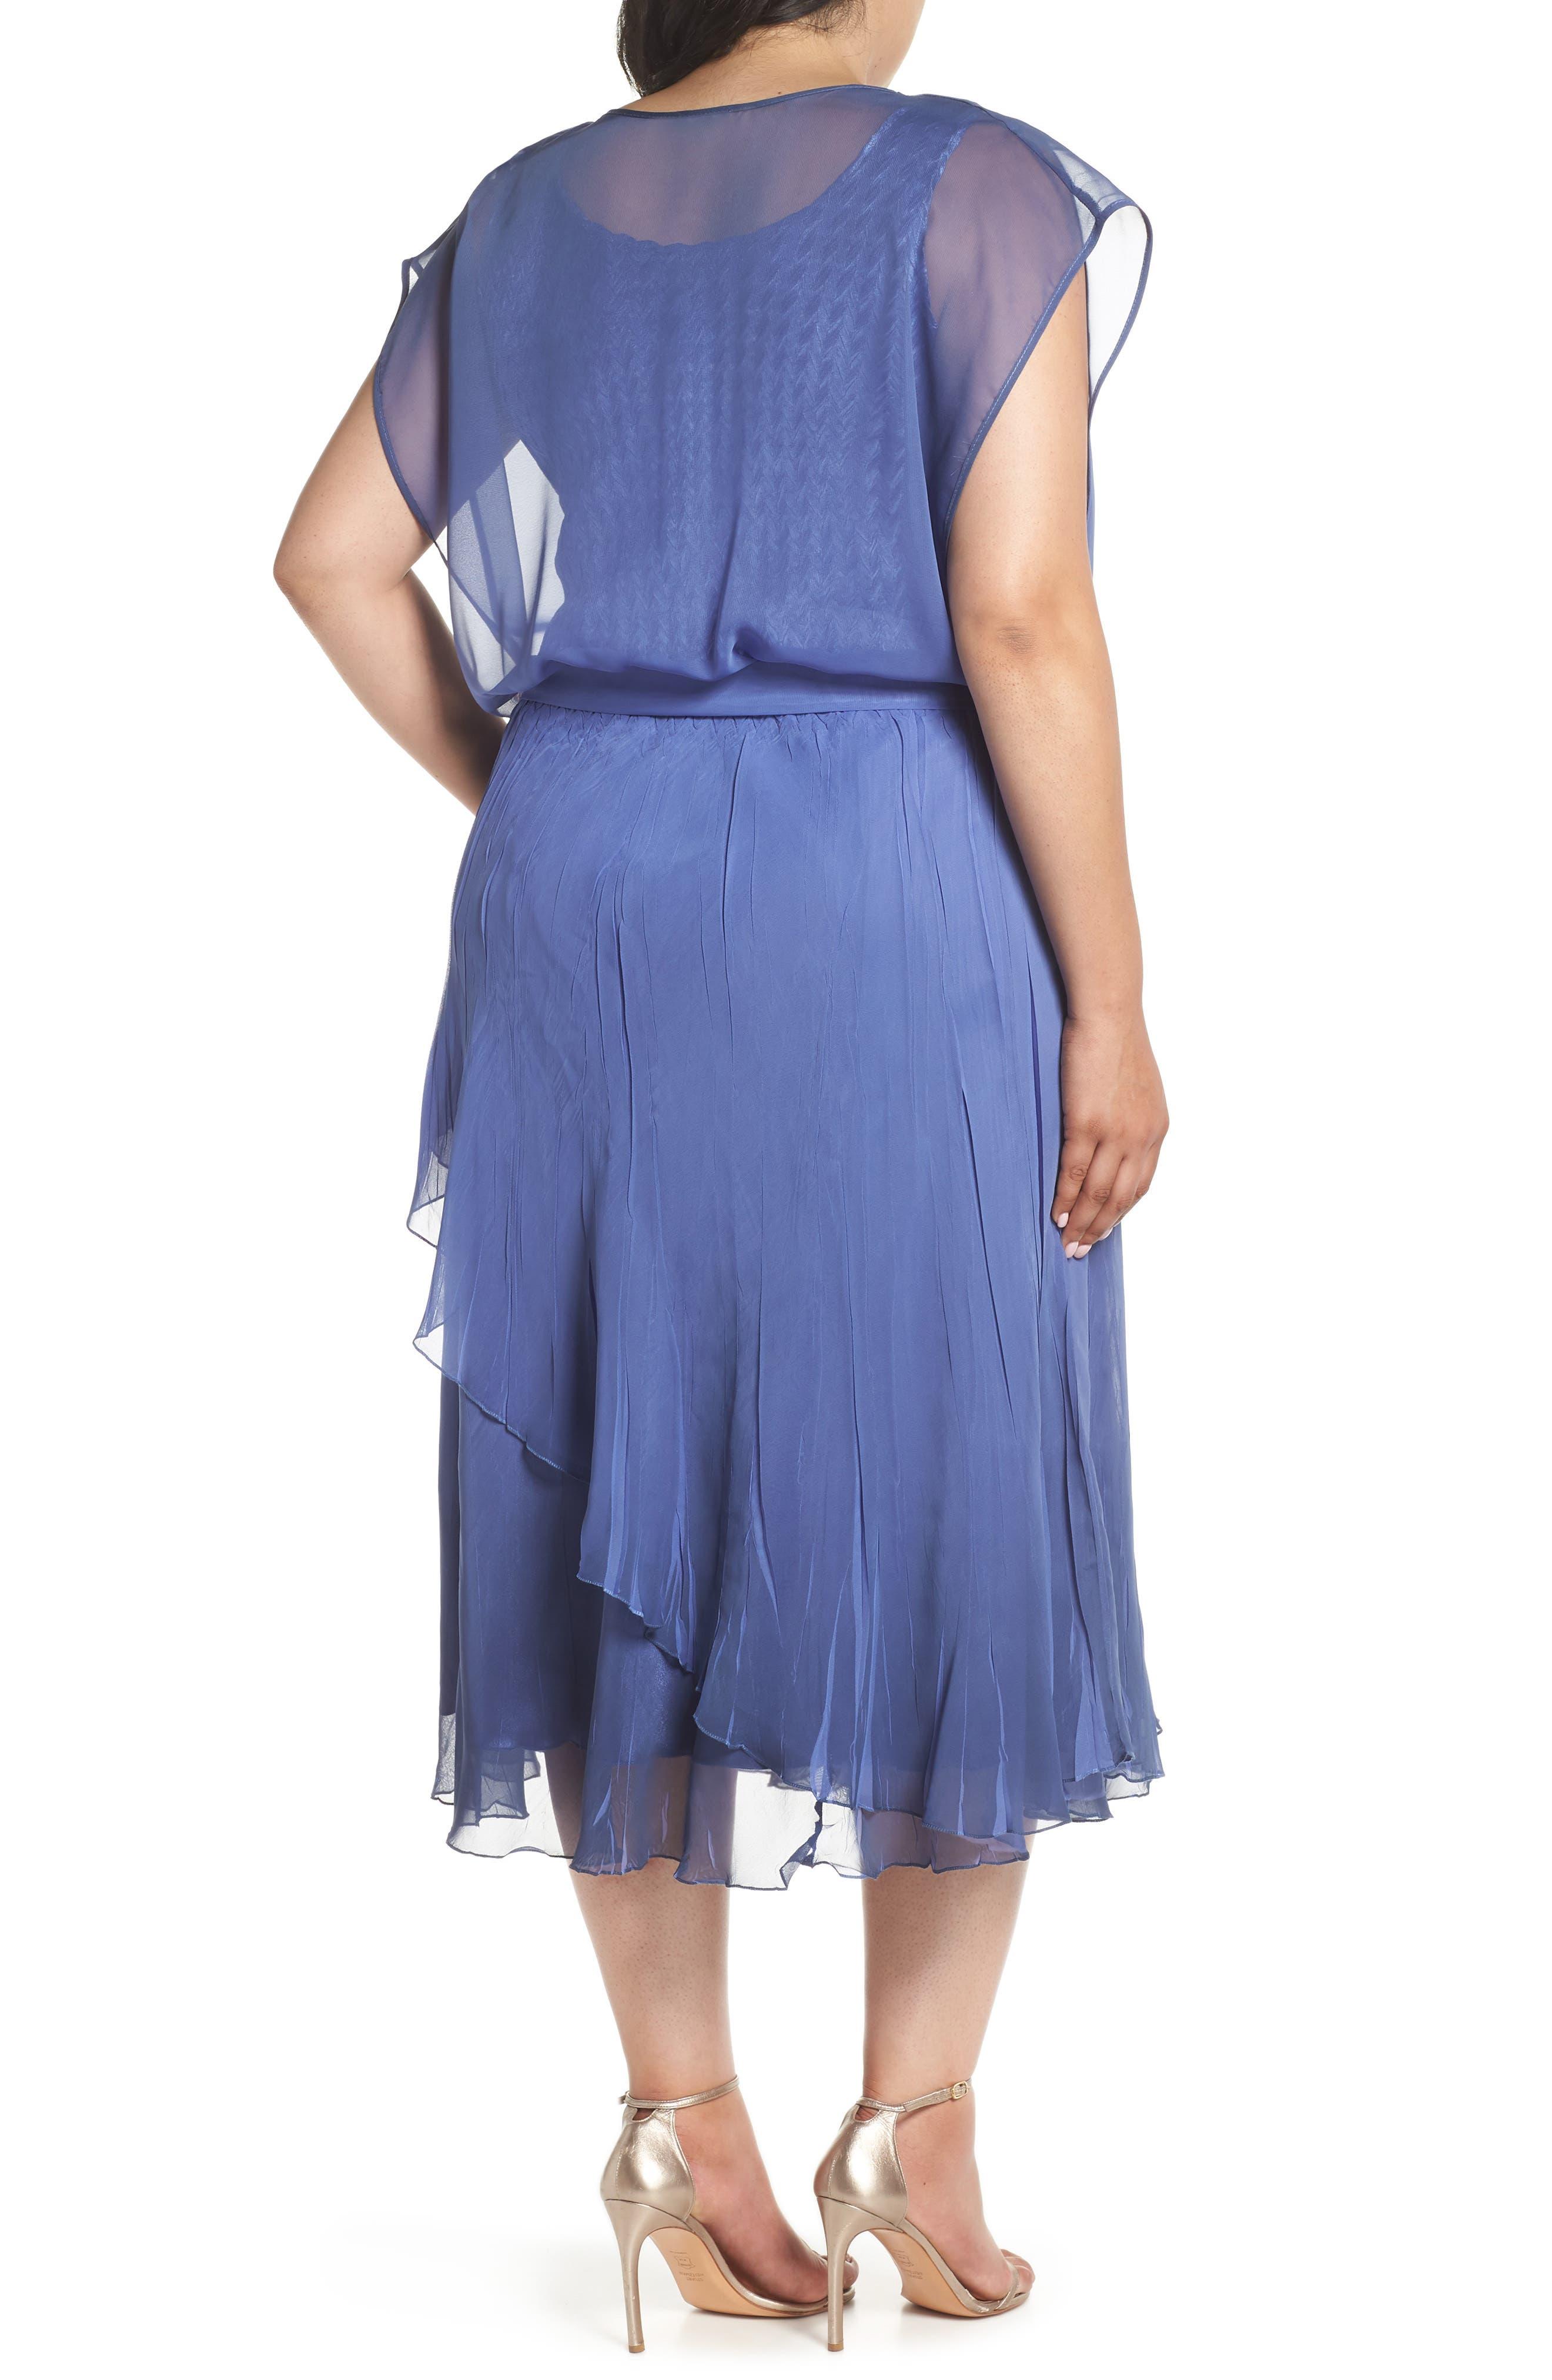 Charmeuse & Chiffon Blouson Dress,                             Alternate thumbnail 2, color,                             Fregatta Blue Ombre